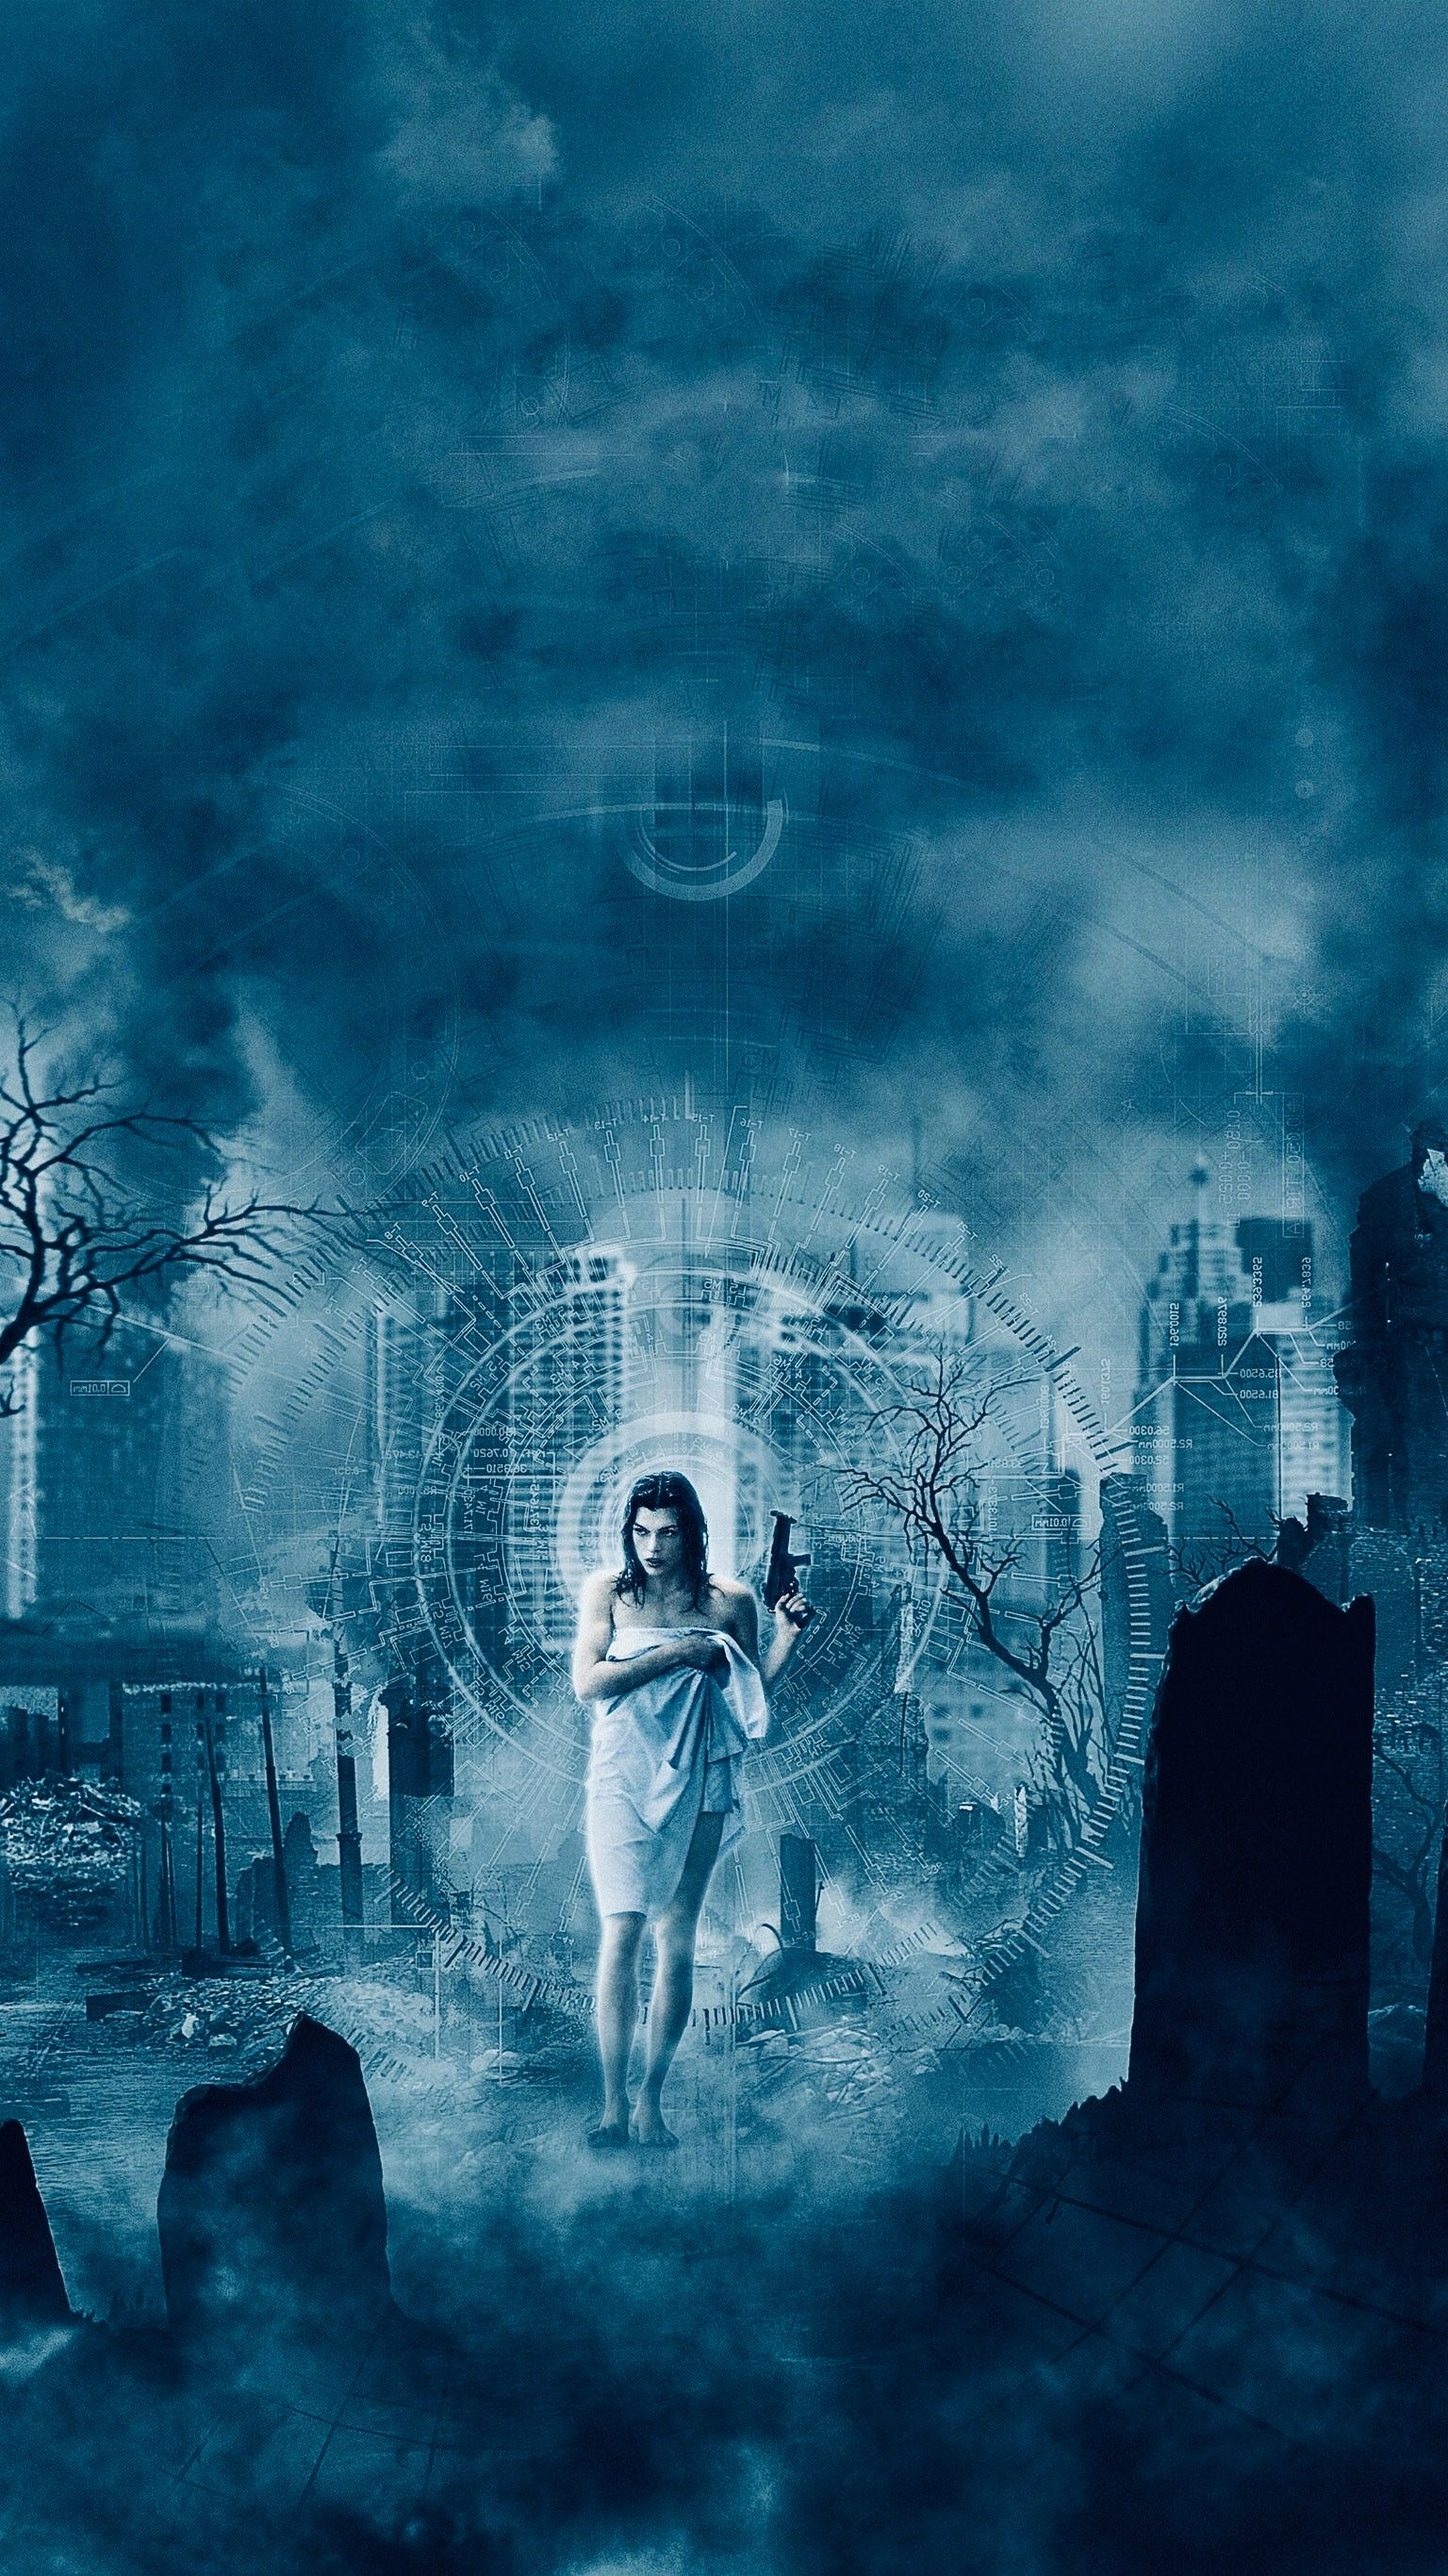 Zombie Apocalypse 2021 Movie - Zombie Apocalypse 2021 Some ...